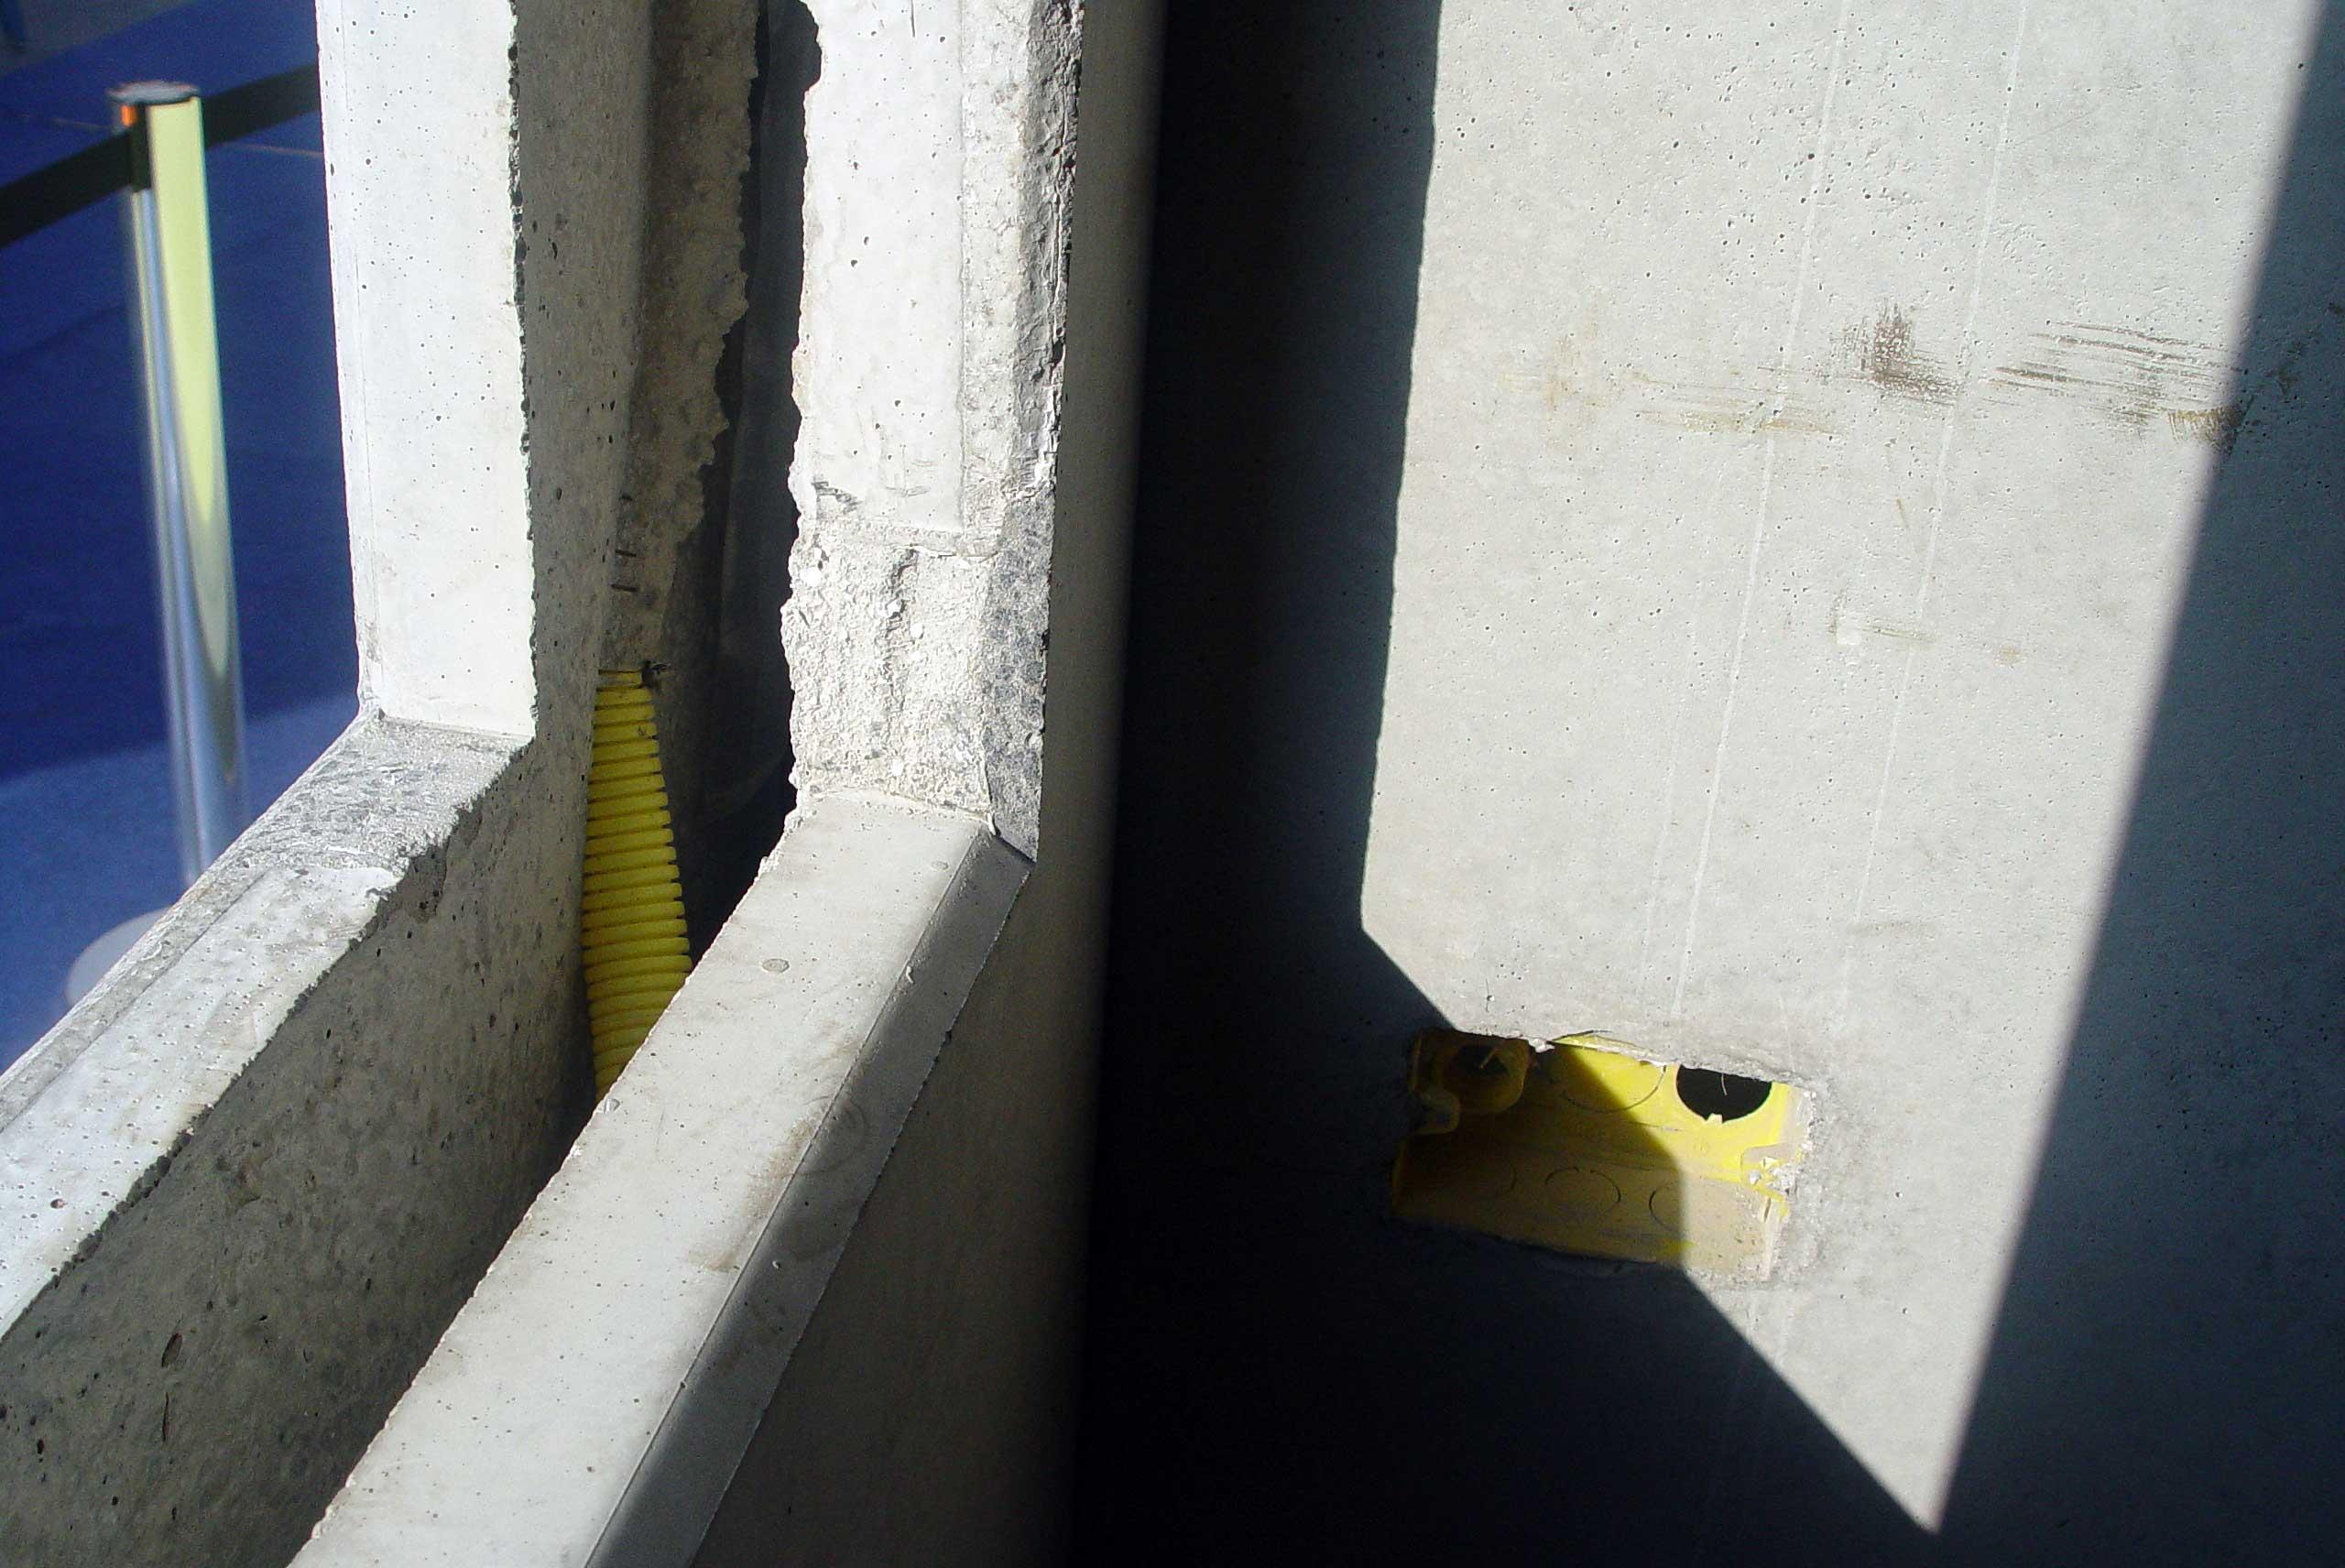 #283A66  aberturas para portas janelas e sistemas elétricos e hidráulicos 470 Janelas Duplas Isolamento